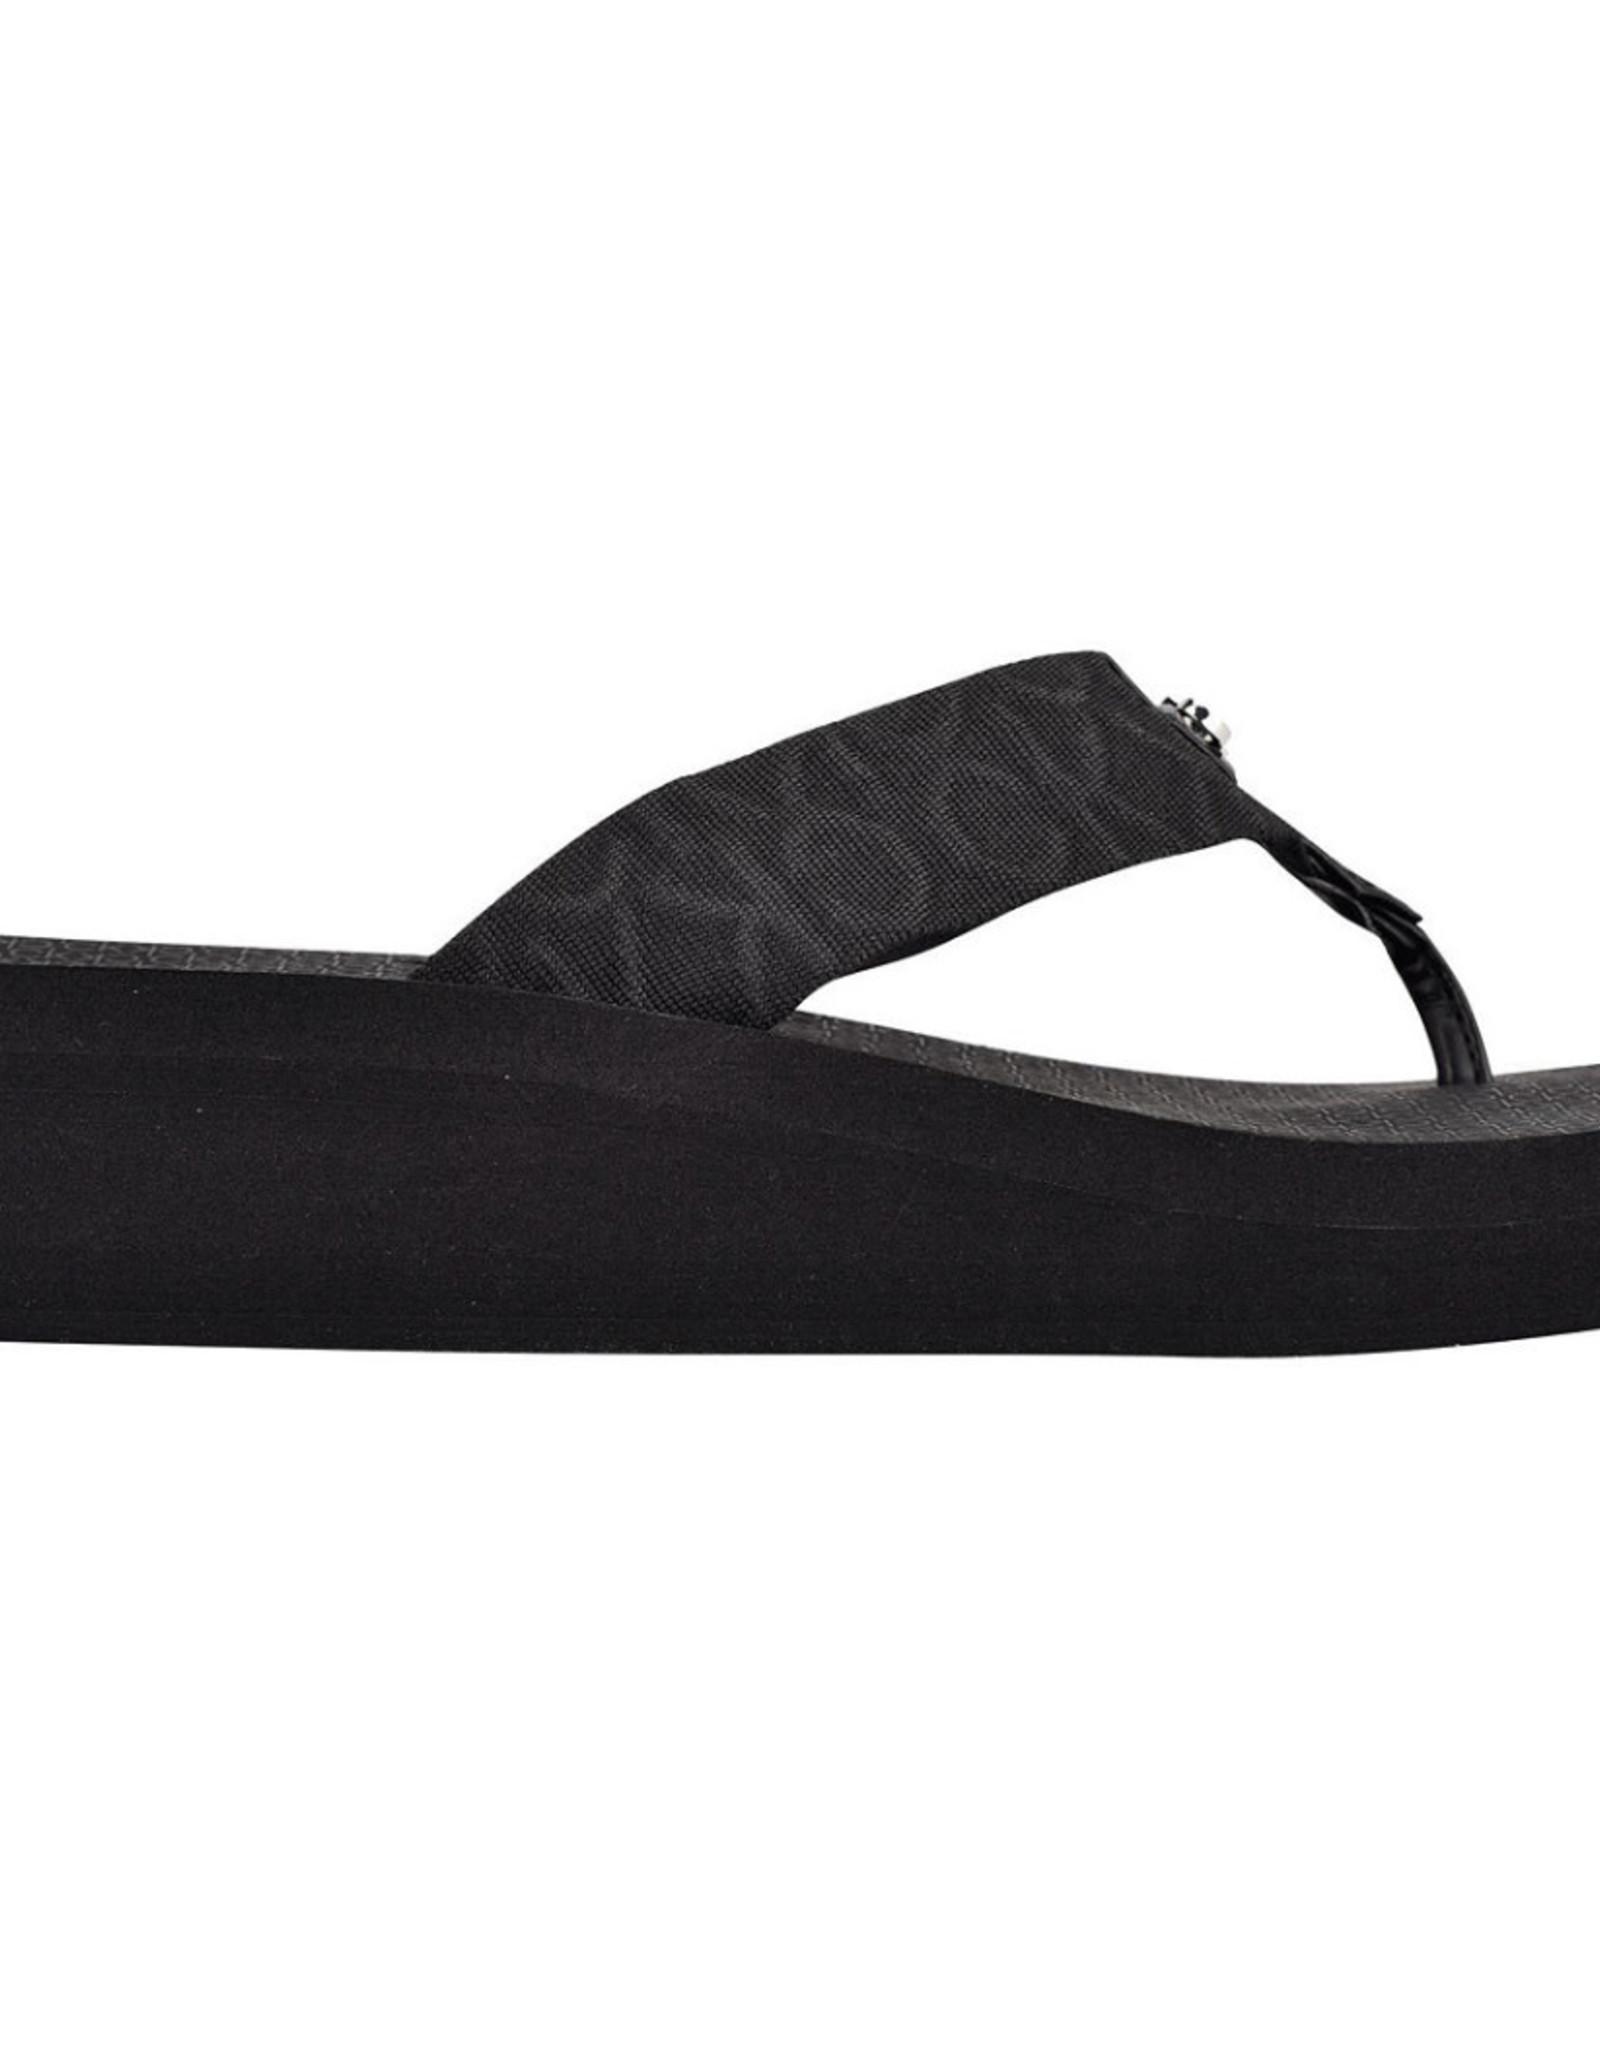 Calvin Klein Calvin Klein Meena Beach Slip-On Wedge Flip Flops